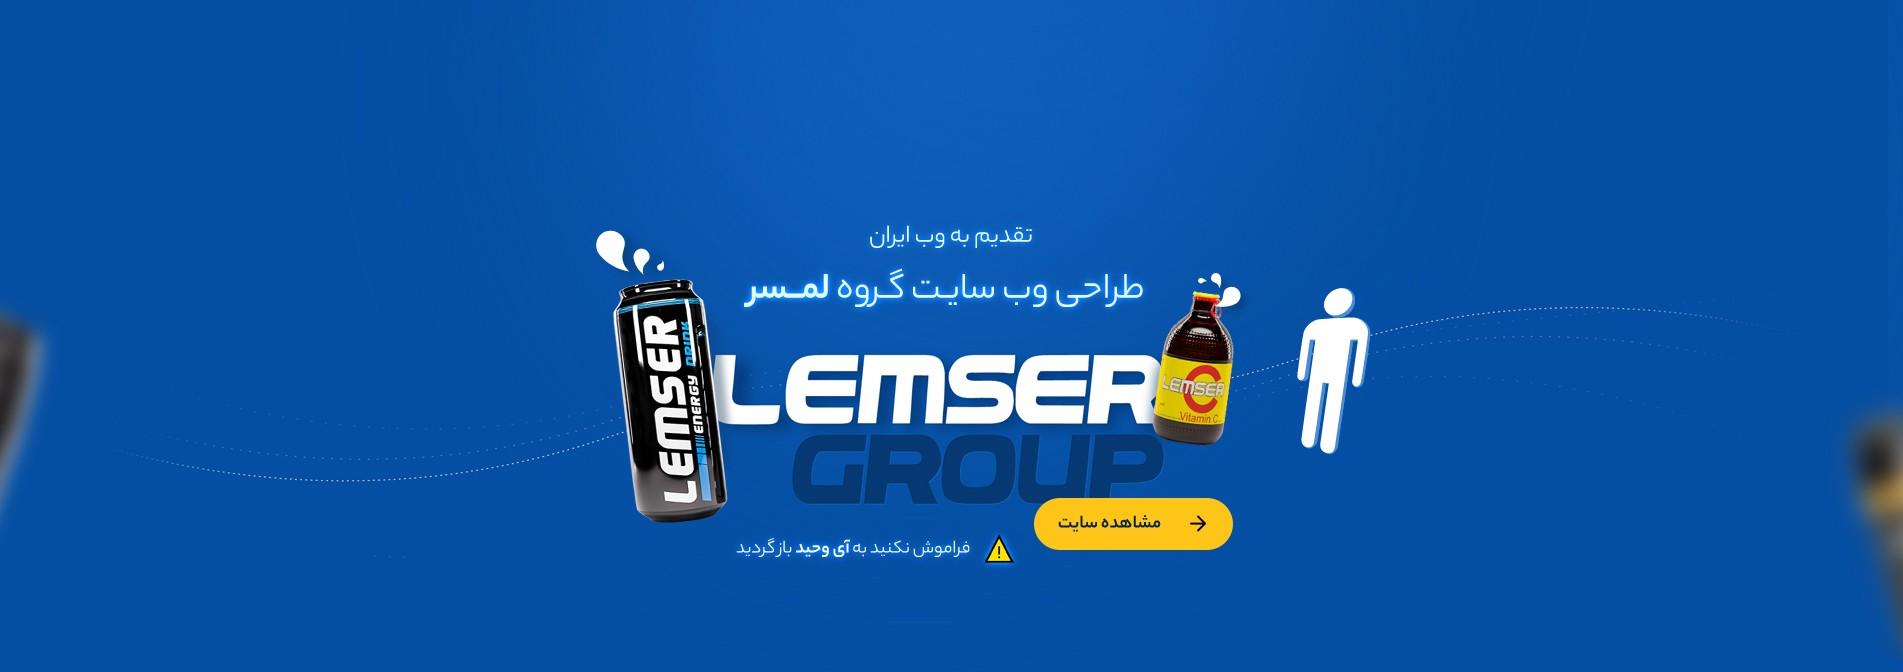 طراحی سایت گروه لمسر صادق تجارت وحید